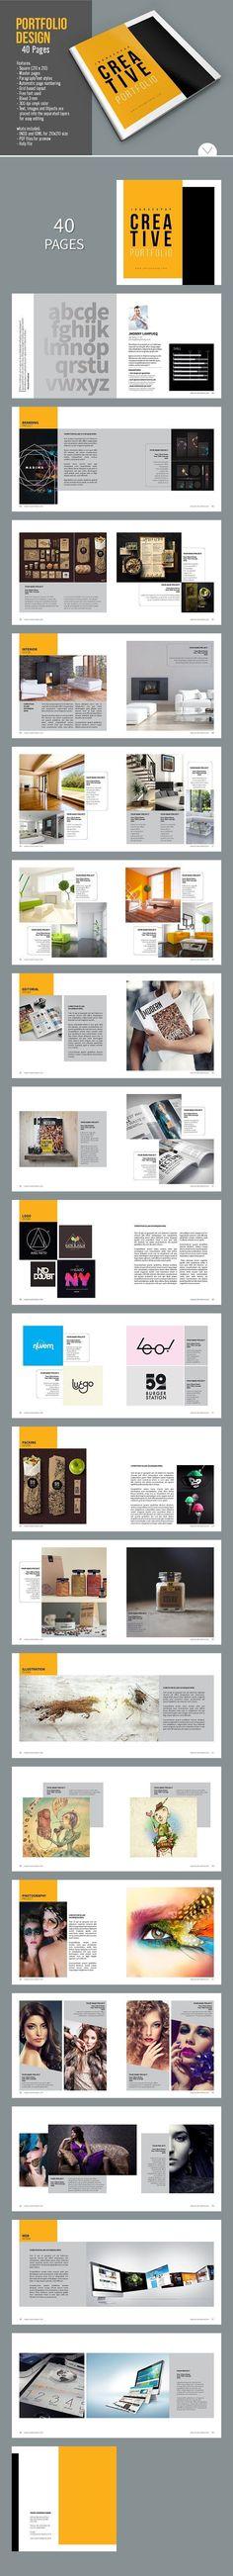 Graphic Design Portfolio Template by Top Design on @creativemarket